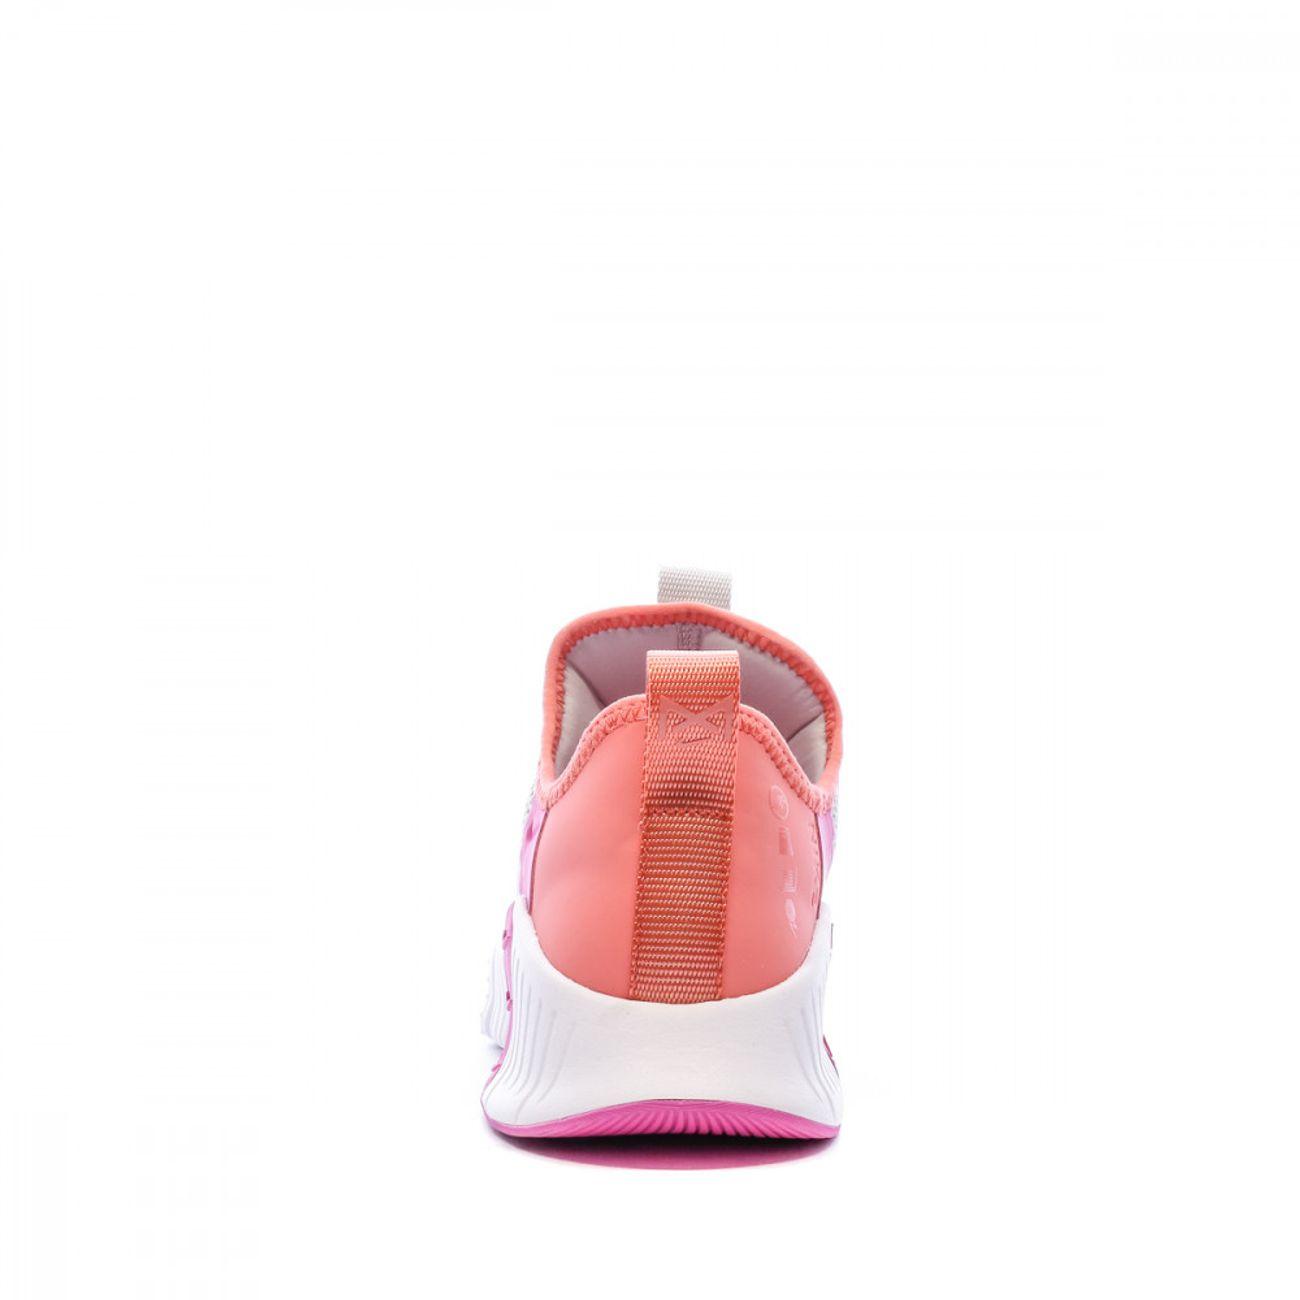 femme NIKE Baskets Grises Femme Nike Metcon 3